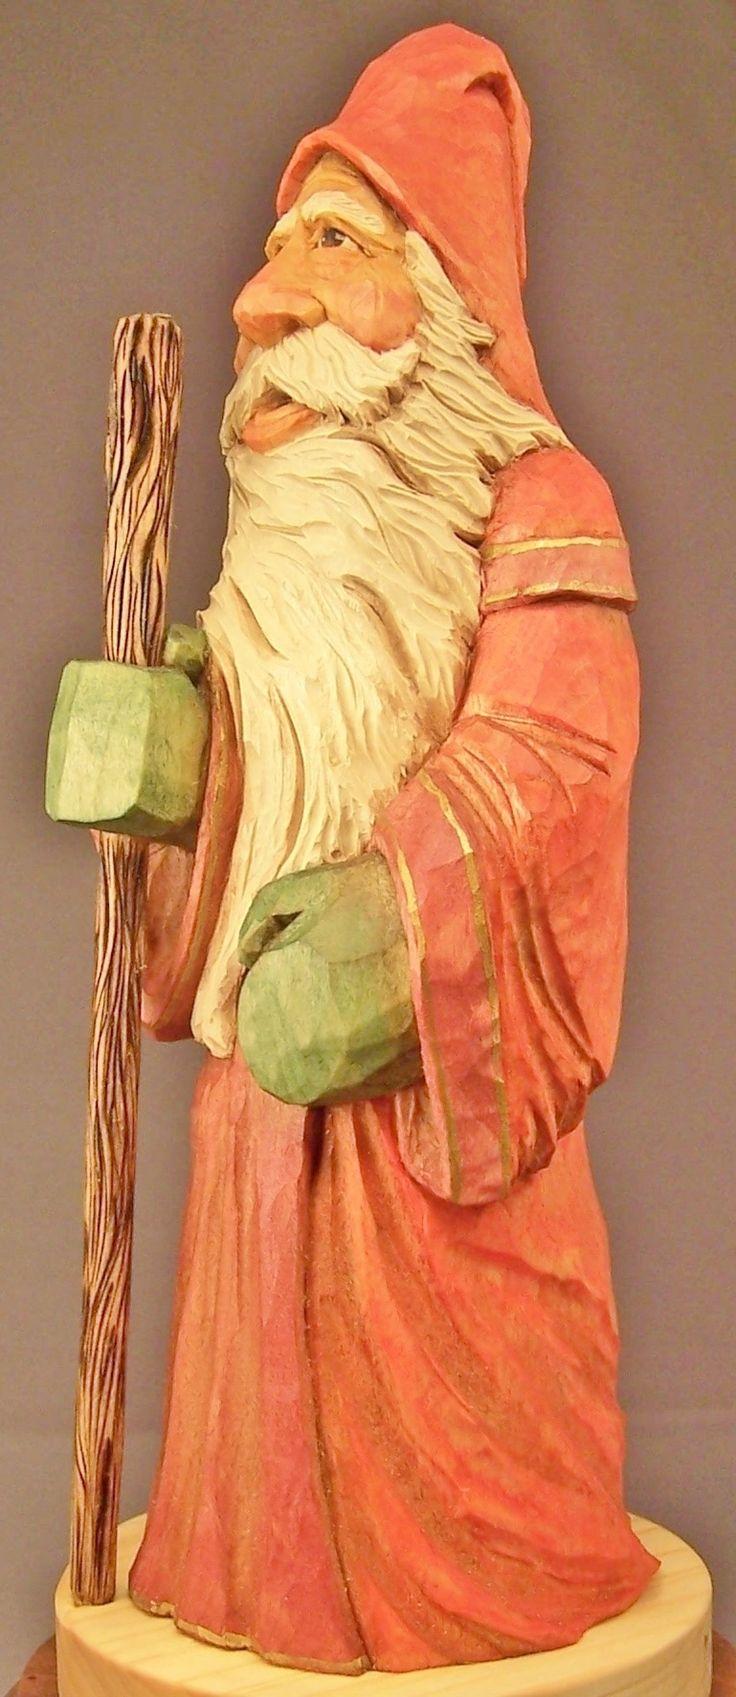 529 best Santa images on Pinterest   Carved wood, Wood carvings ...